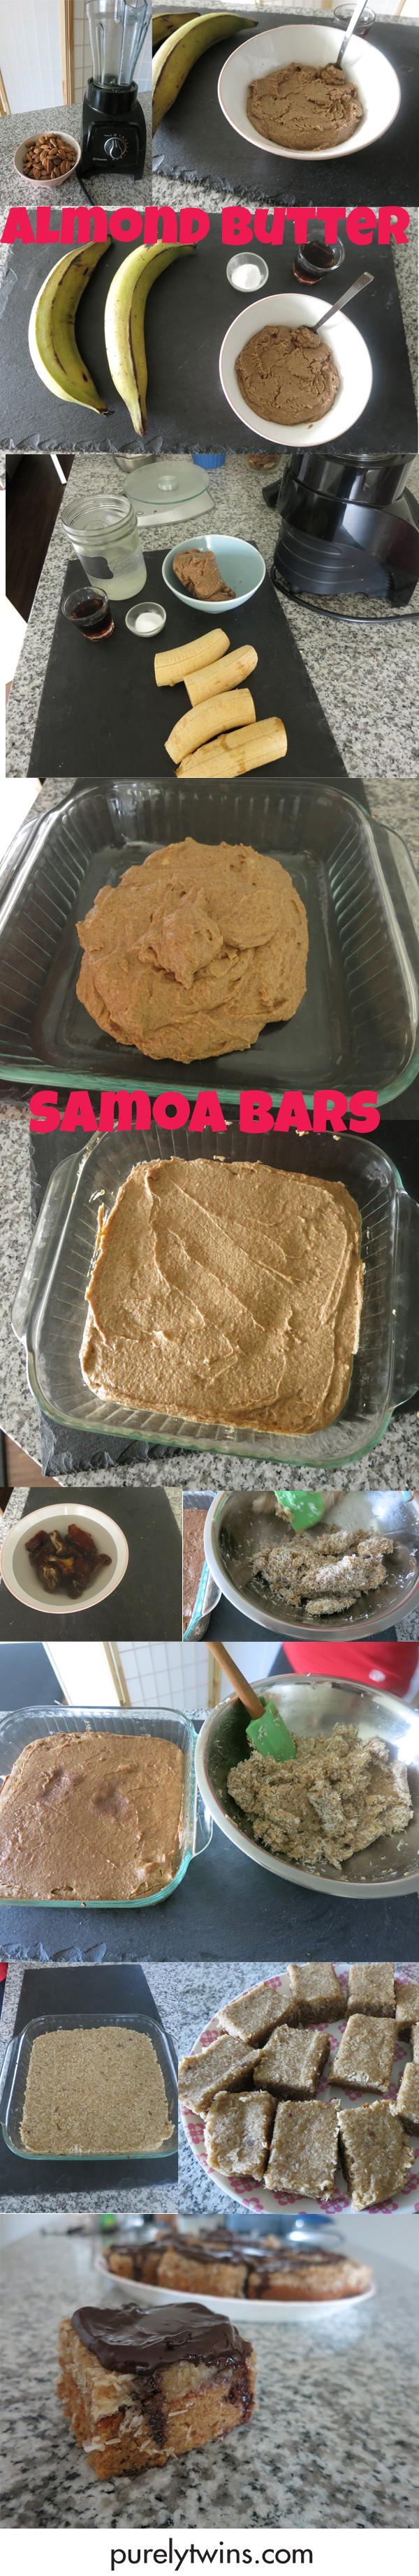 how to make almond butter samoa bars